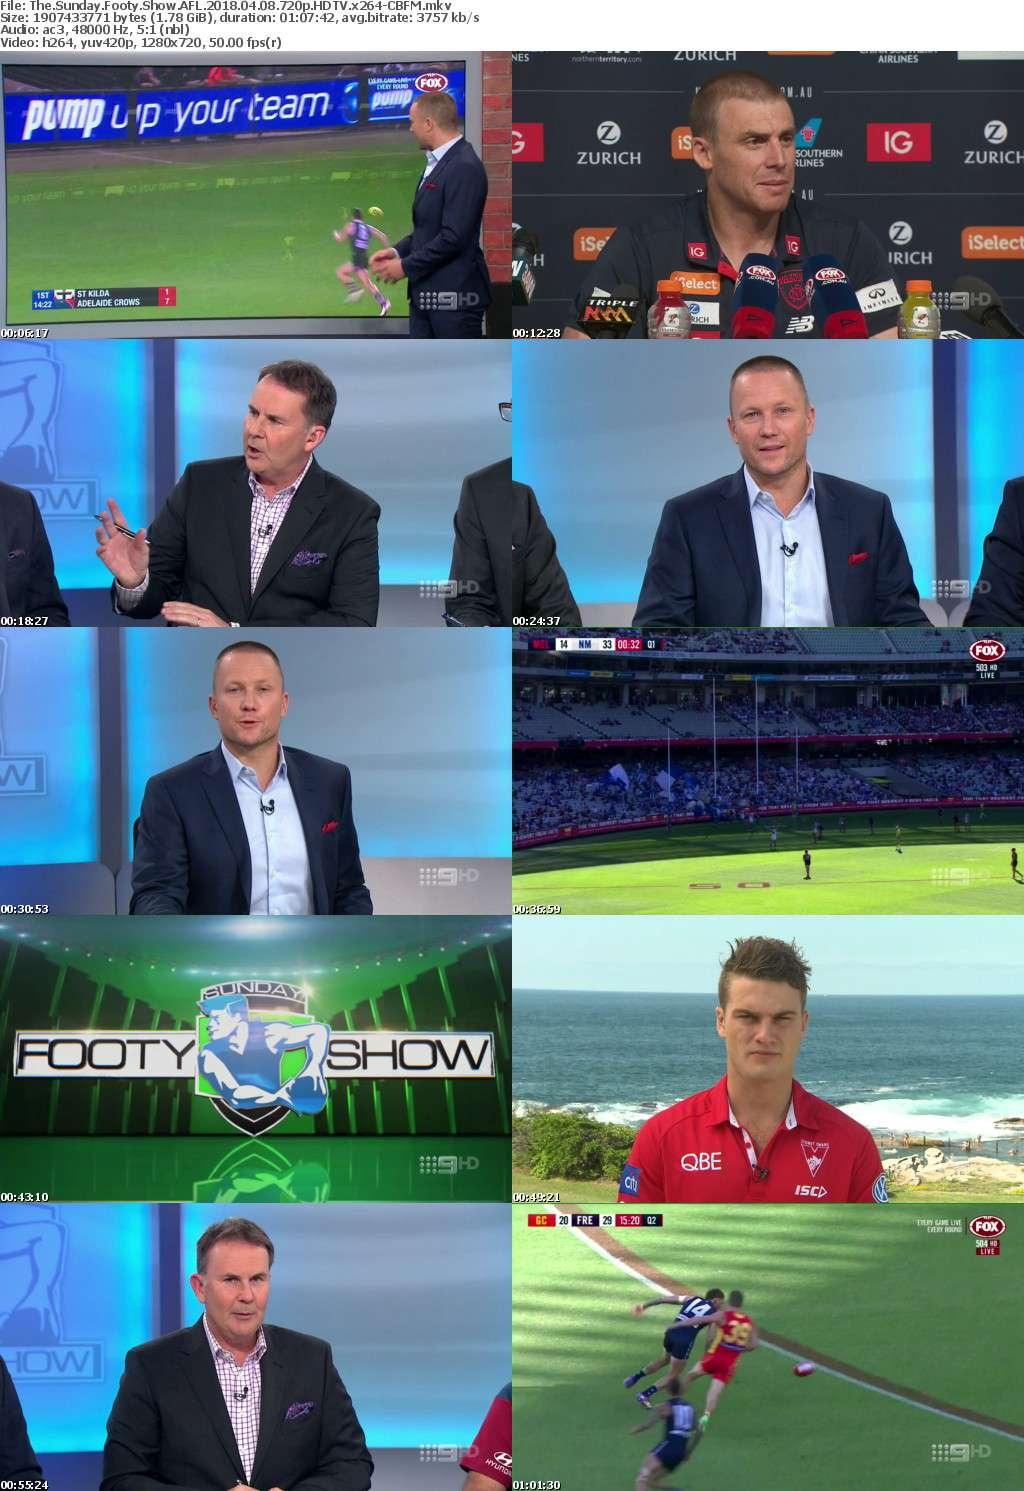 The Sunday Footy Show AFL 2018 04 08 720p HDTV x264-CBFM